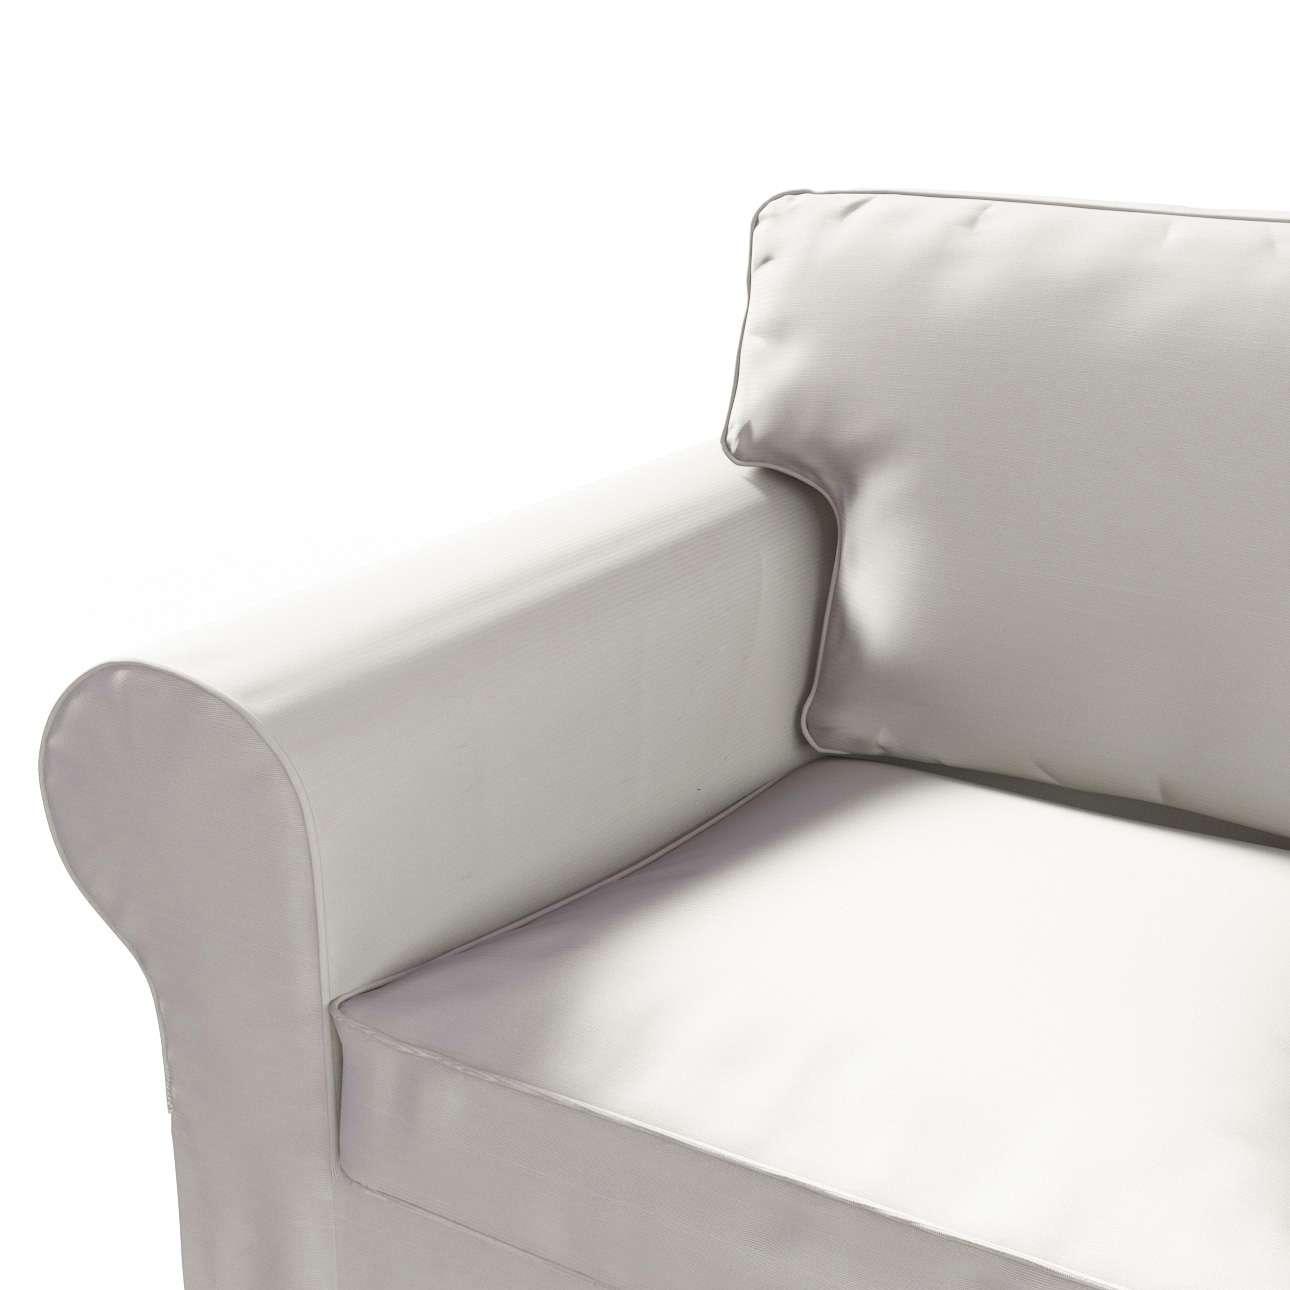 Ektorp 2 sæder sovesofa gammel model<br/>Bredde ca 195cm Betræk uden sofa fra kollektionen Cotton Panama, Stof: 702-31